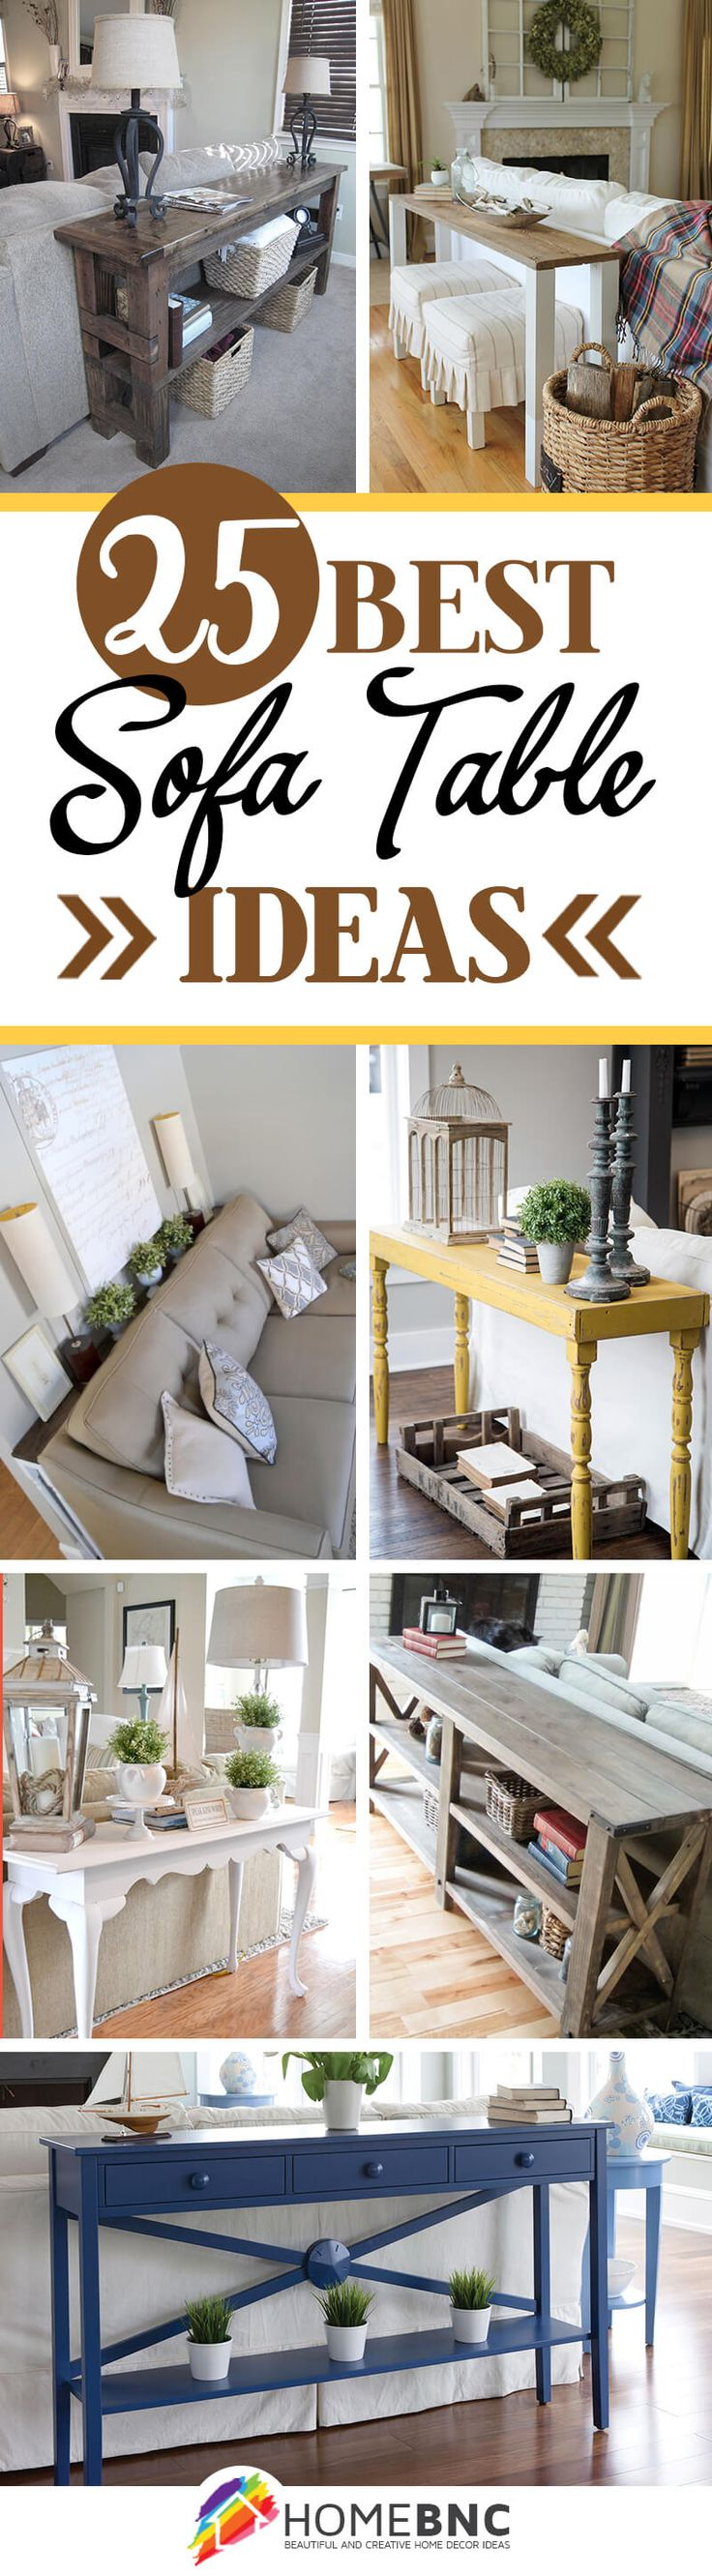 25 on trend sofa table ideas